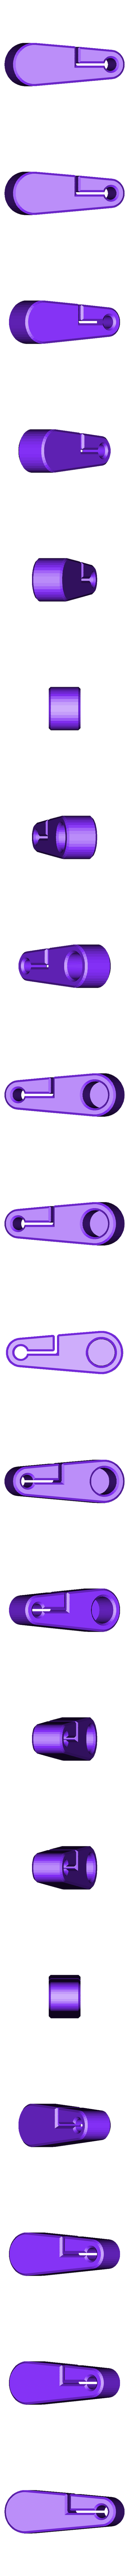 Guide.STL Download free STL file PortaReel Portable Fishing Pole • 3D printable model, mechengineermike